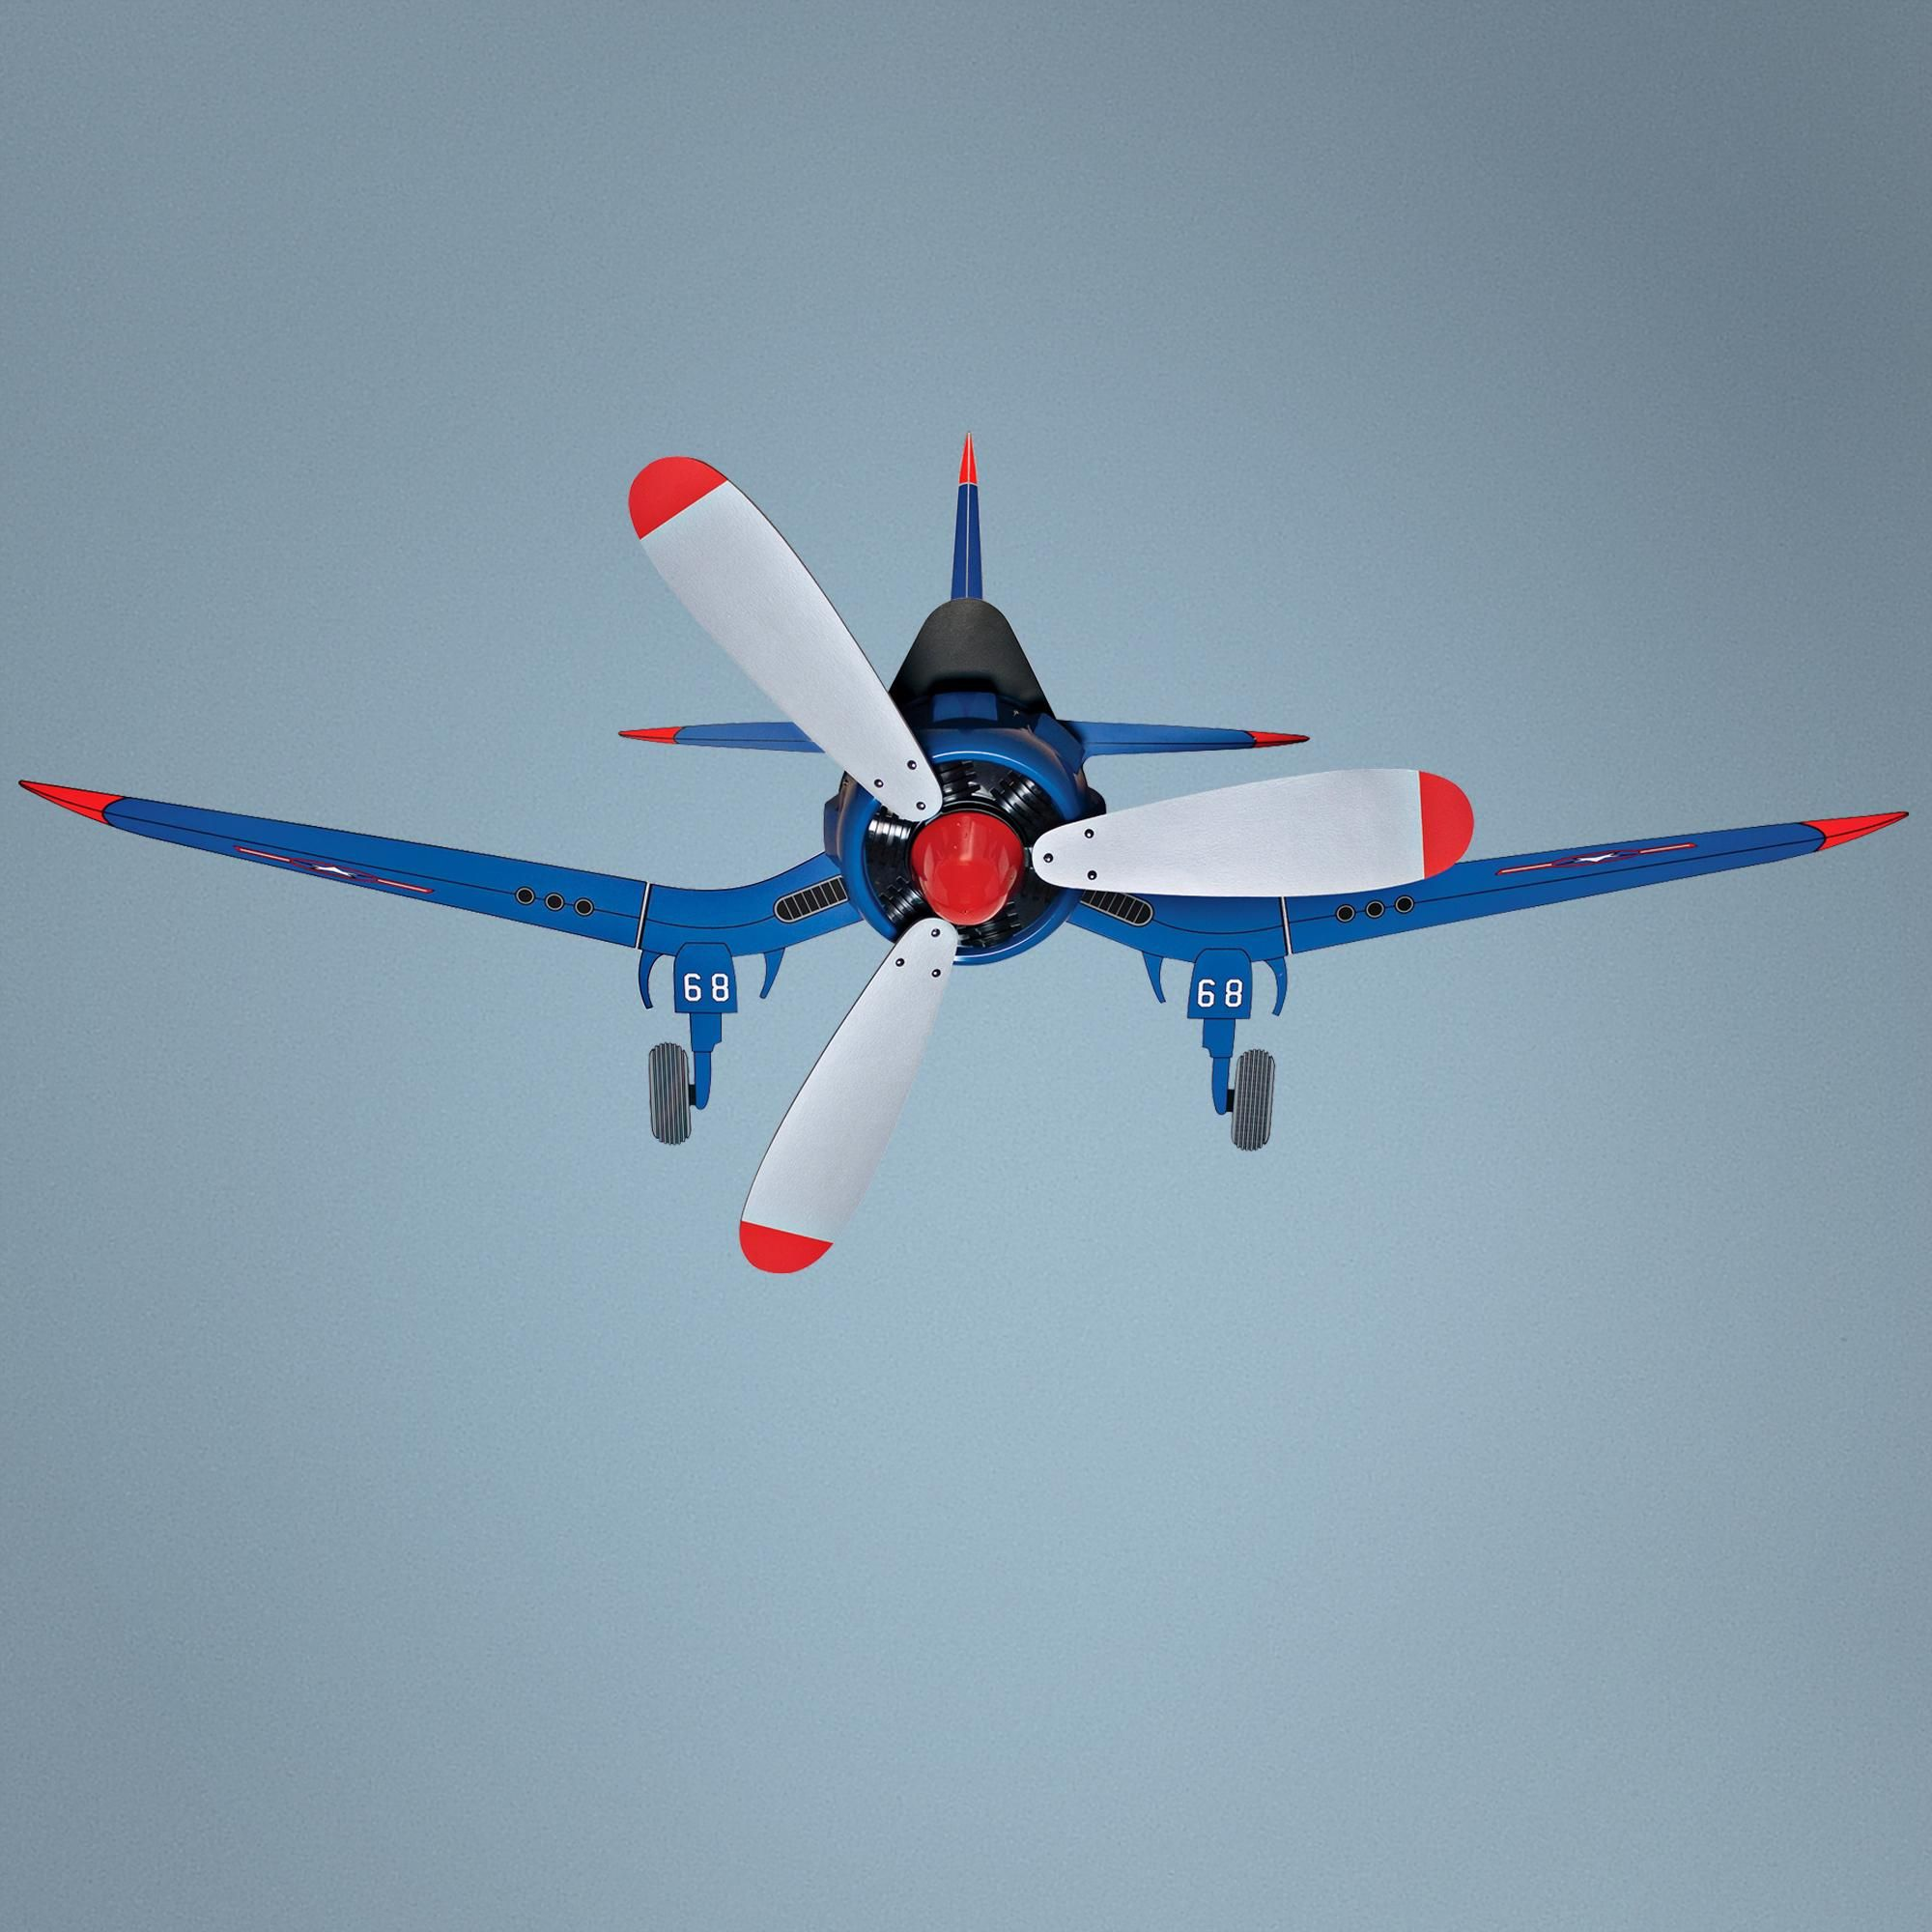 48 Quot Fantasy Flyer Airplane Ceiling Fan For Hogans Room